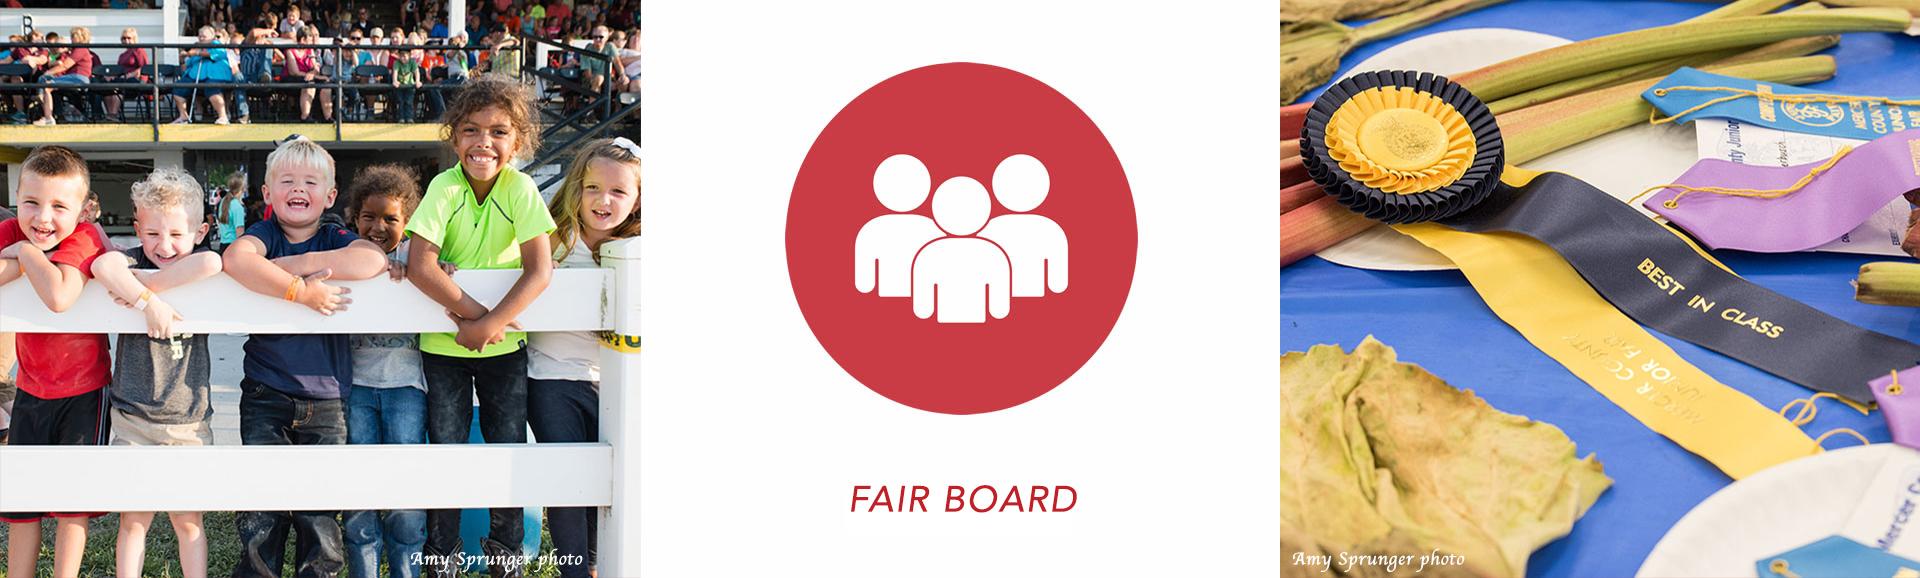 fair board Main Header2